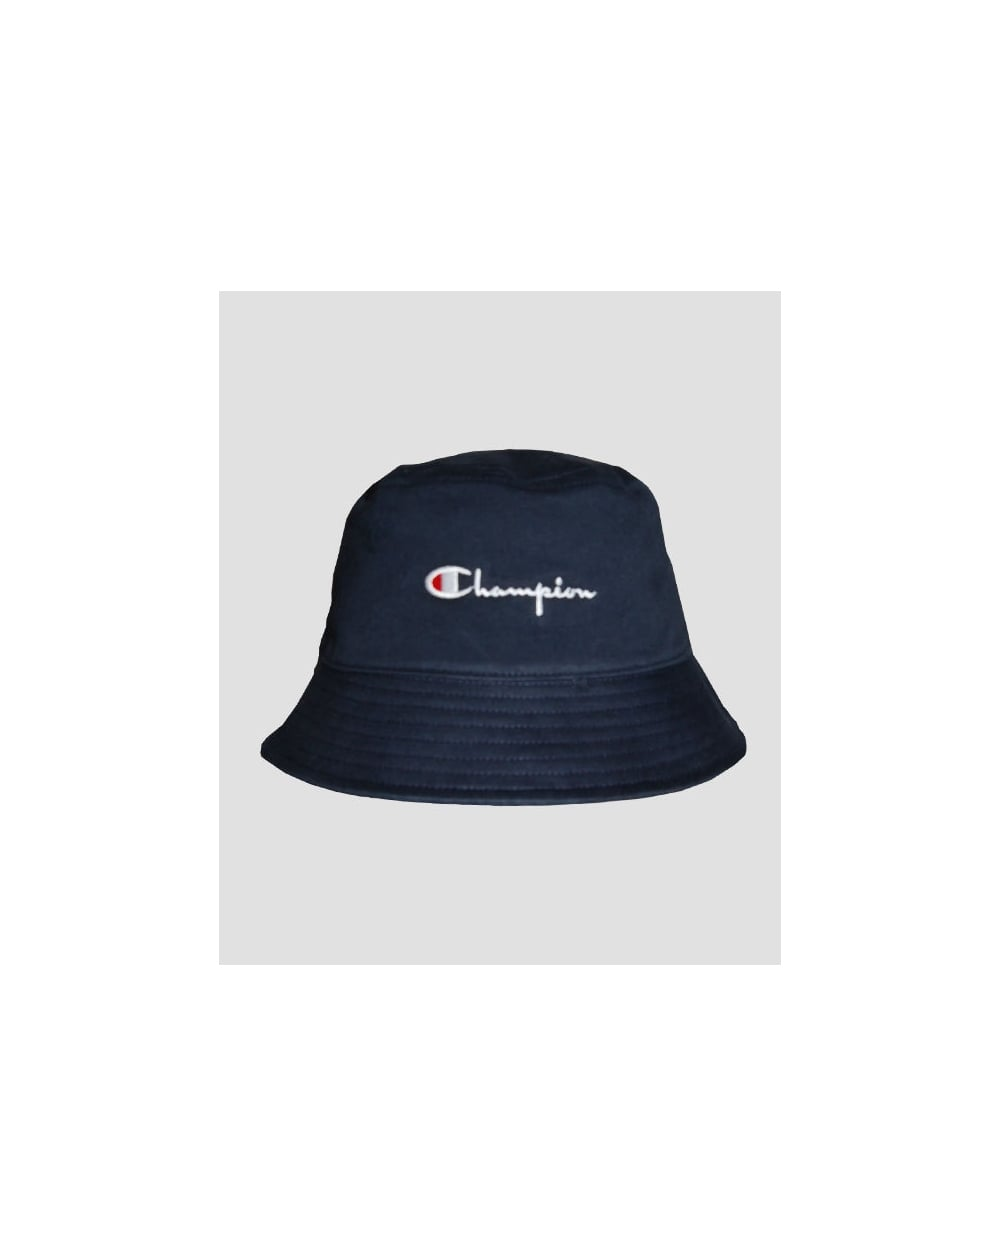 Champion Cotton Twill Bucket Hat Navy